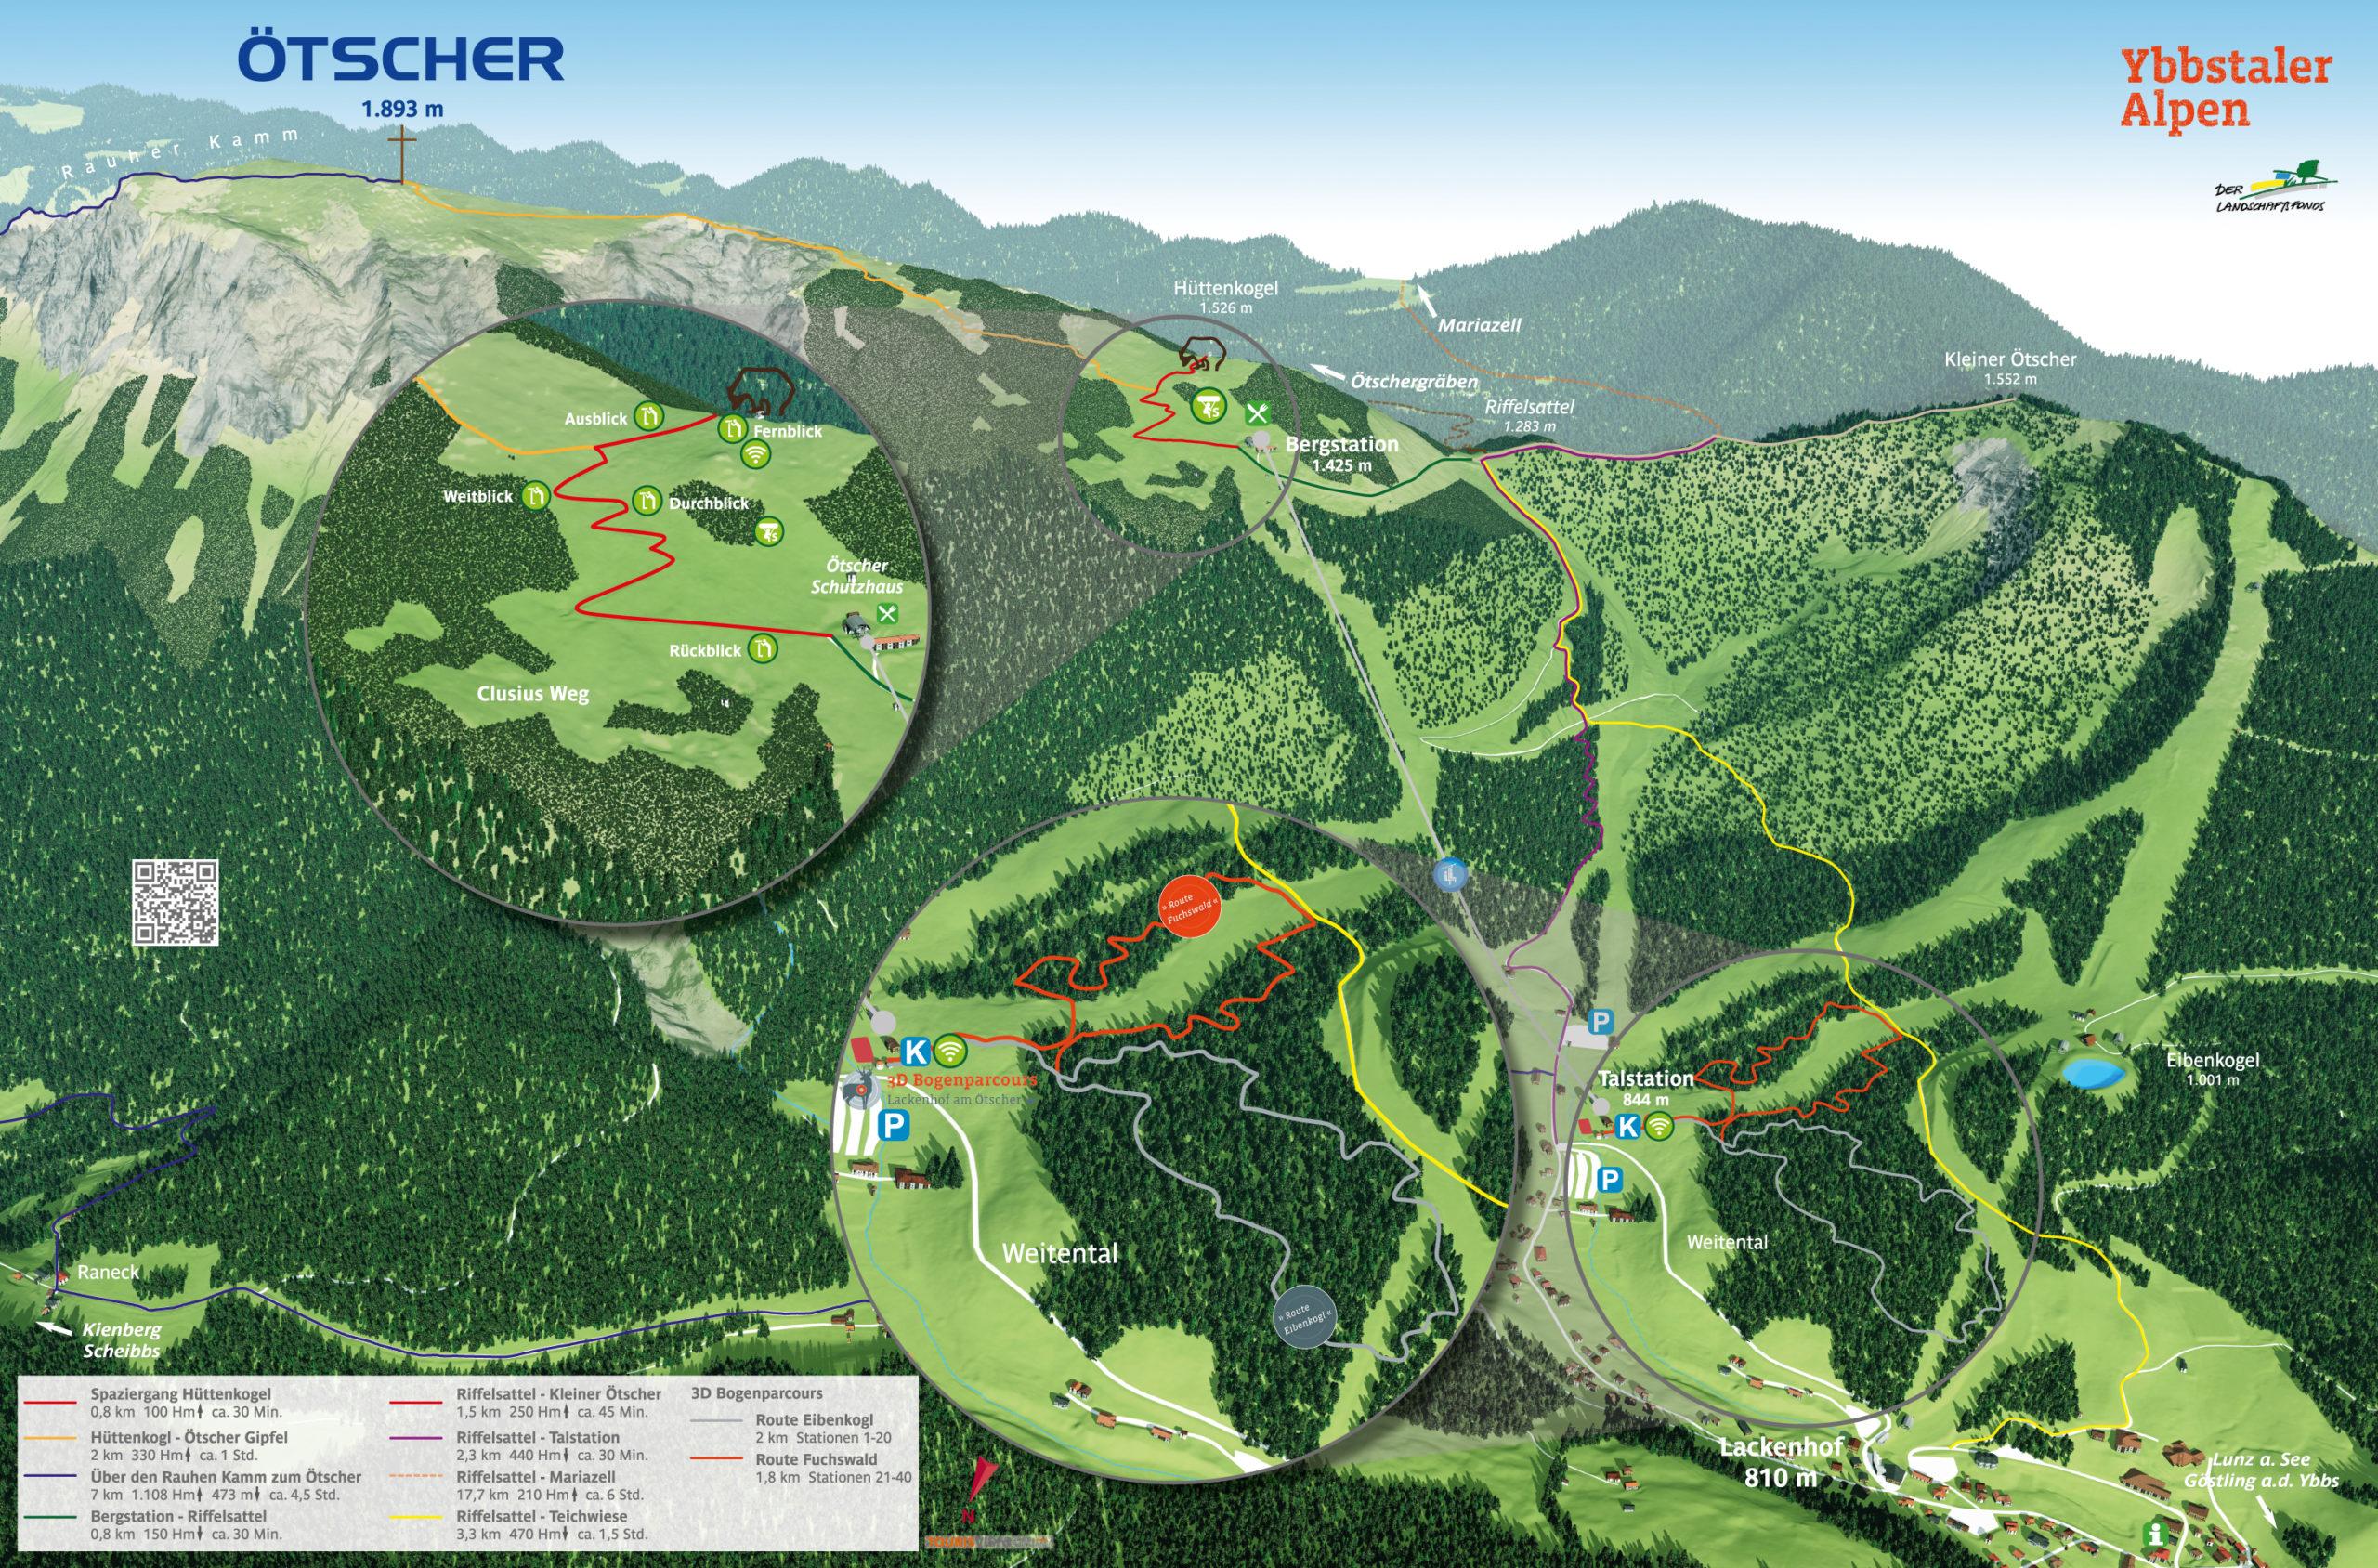 3D Panoramakarte Bogenparcours Wandern Oetscher Lackenhof Ybbstaler Alpen